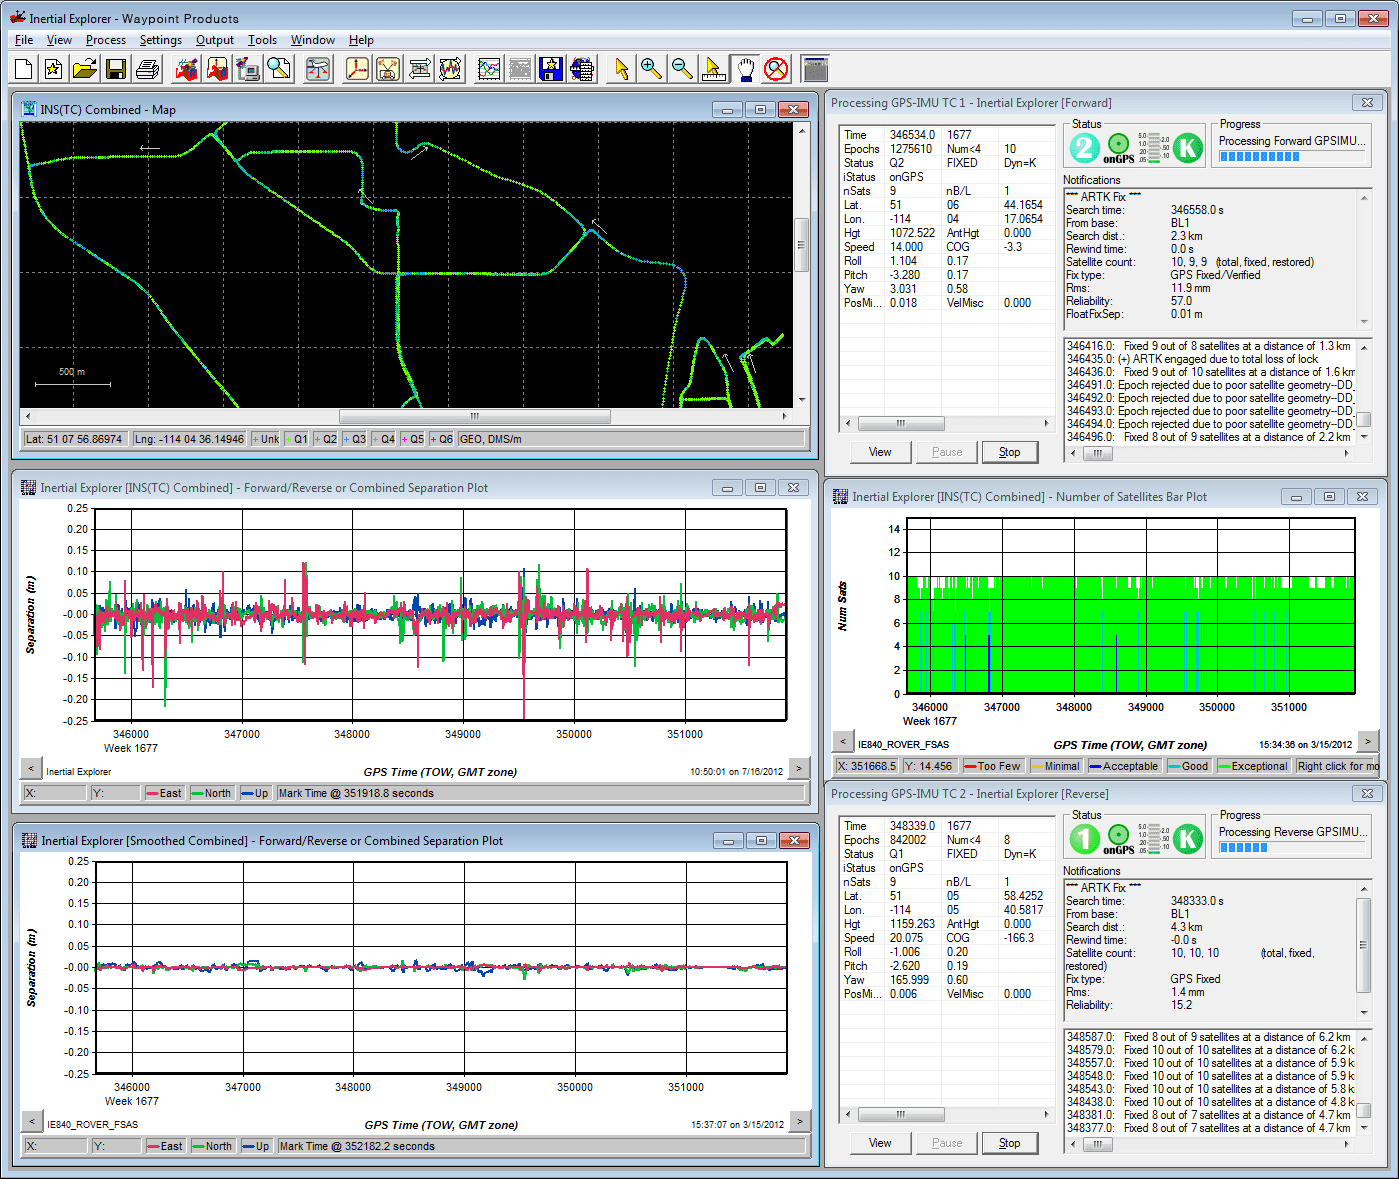 NovAtel Inertial Explorer software